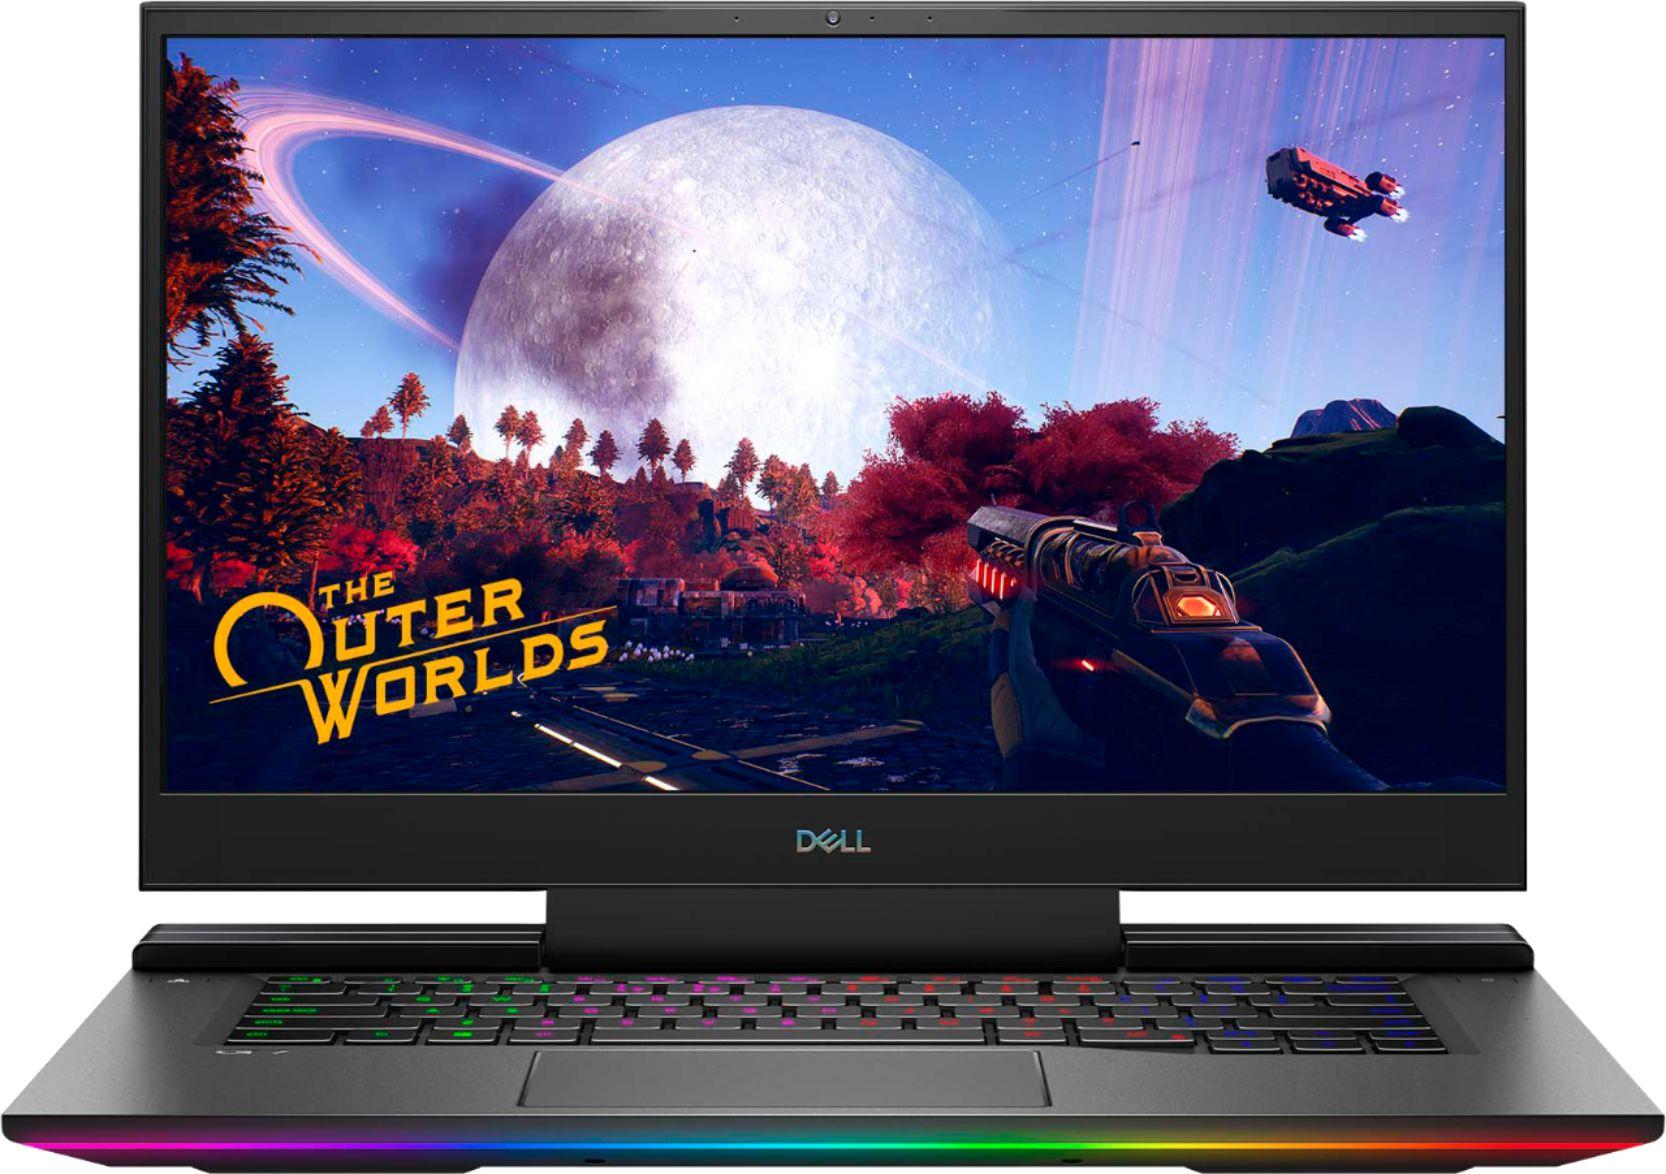 "Dell G7 15.6"" 4K Gaming Laptop OLED Intel Core i7 16GB Memory NVIDIA GEFORCE RTX 2070MQ 1TB SSD 4-Zone RGB Black G7500-7194BLK-PUS - Best Buy"